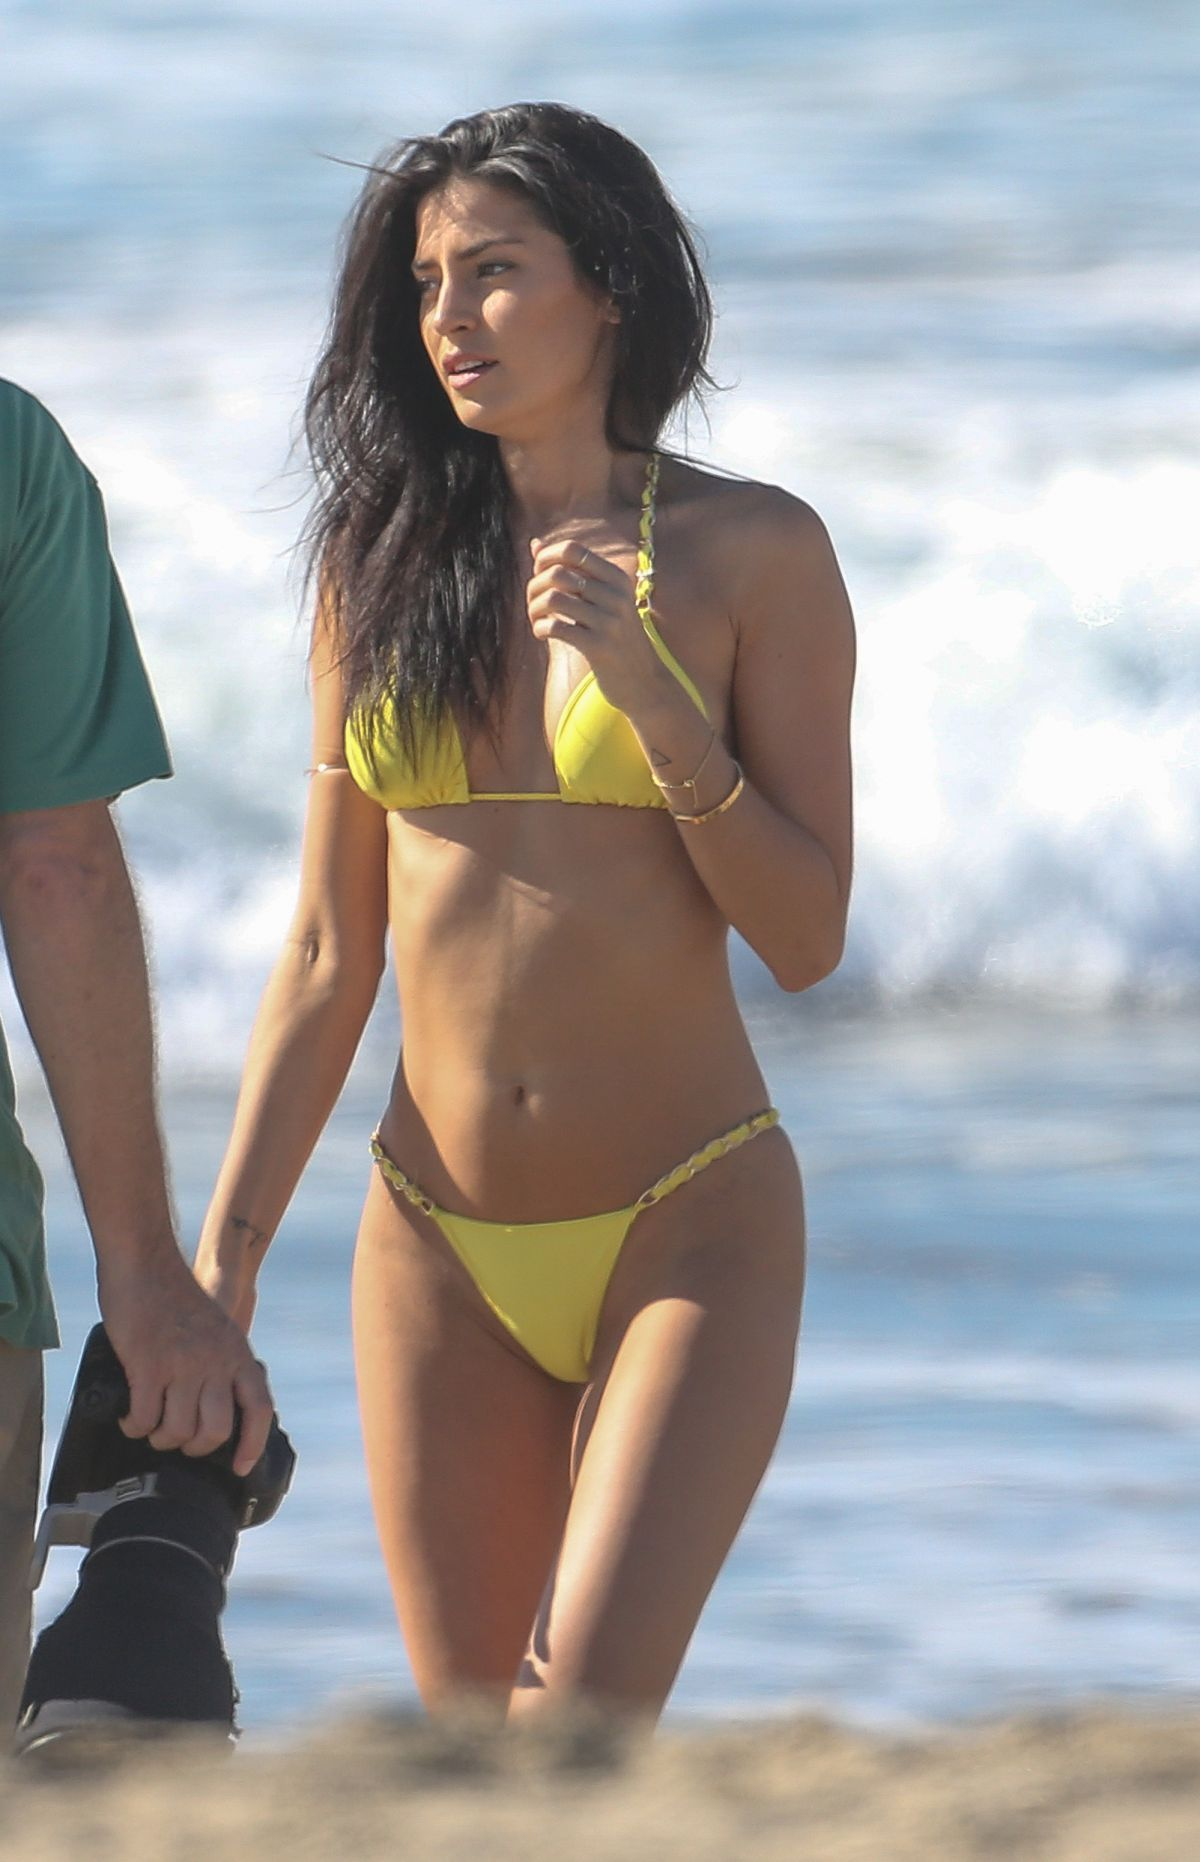 Leaked Nicole Williams nudes (23 foto and video), Tits, Paparazzi, Feet, in bikini 2015